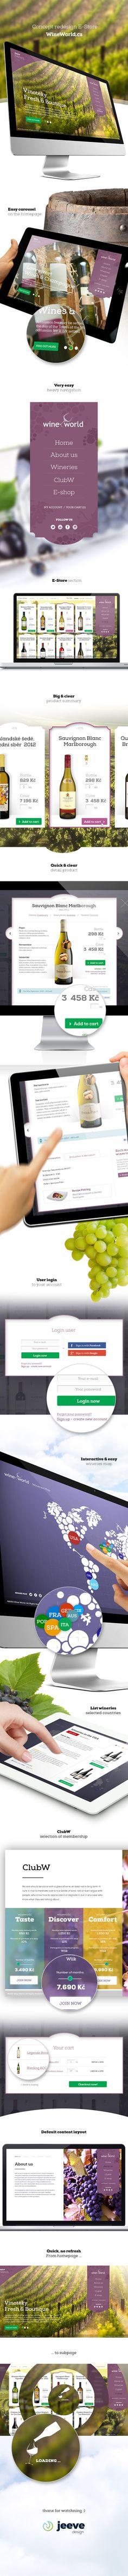 WineWorld - E-Store web design by Jan Vašek, via Behance